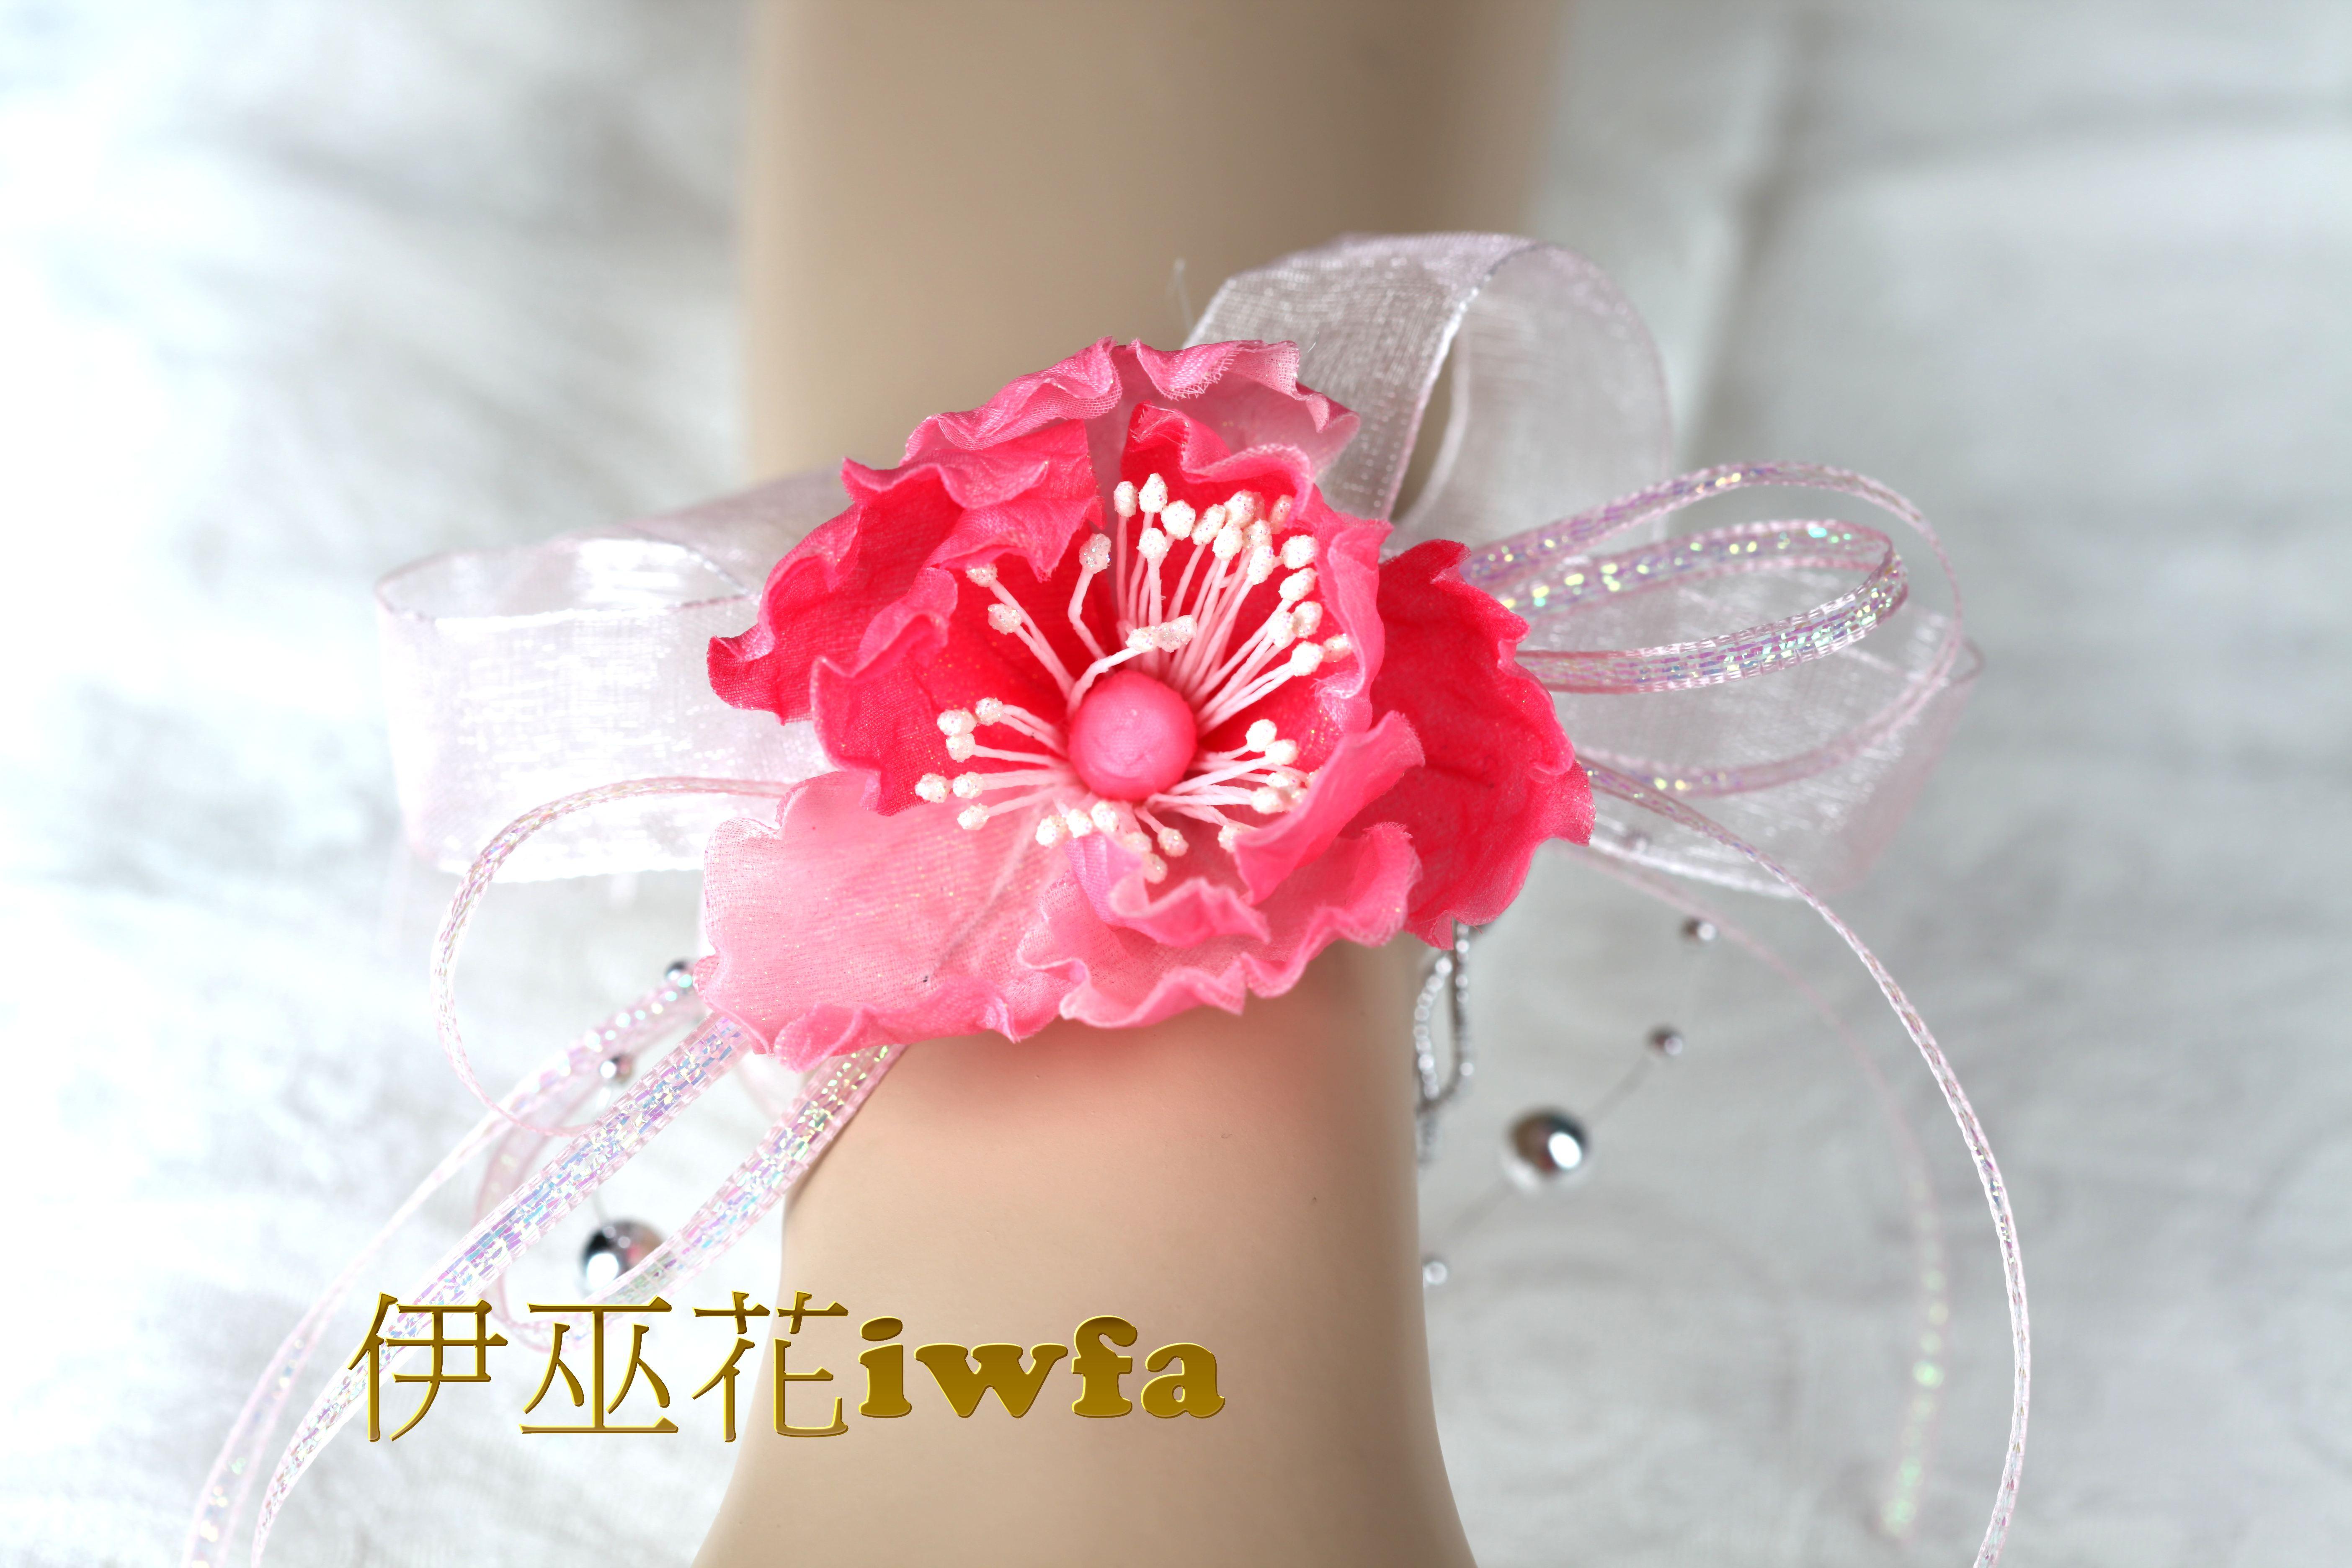 WR012 迷你牡丹 深粉紅